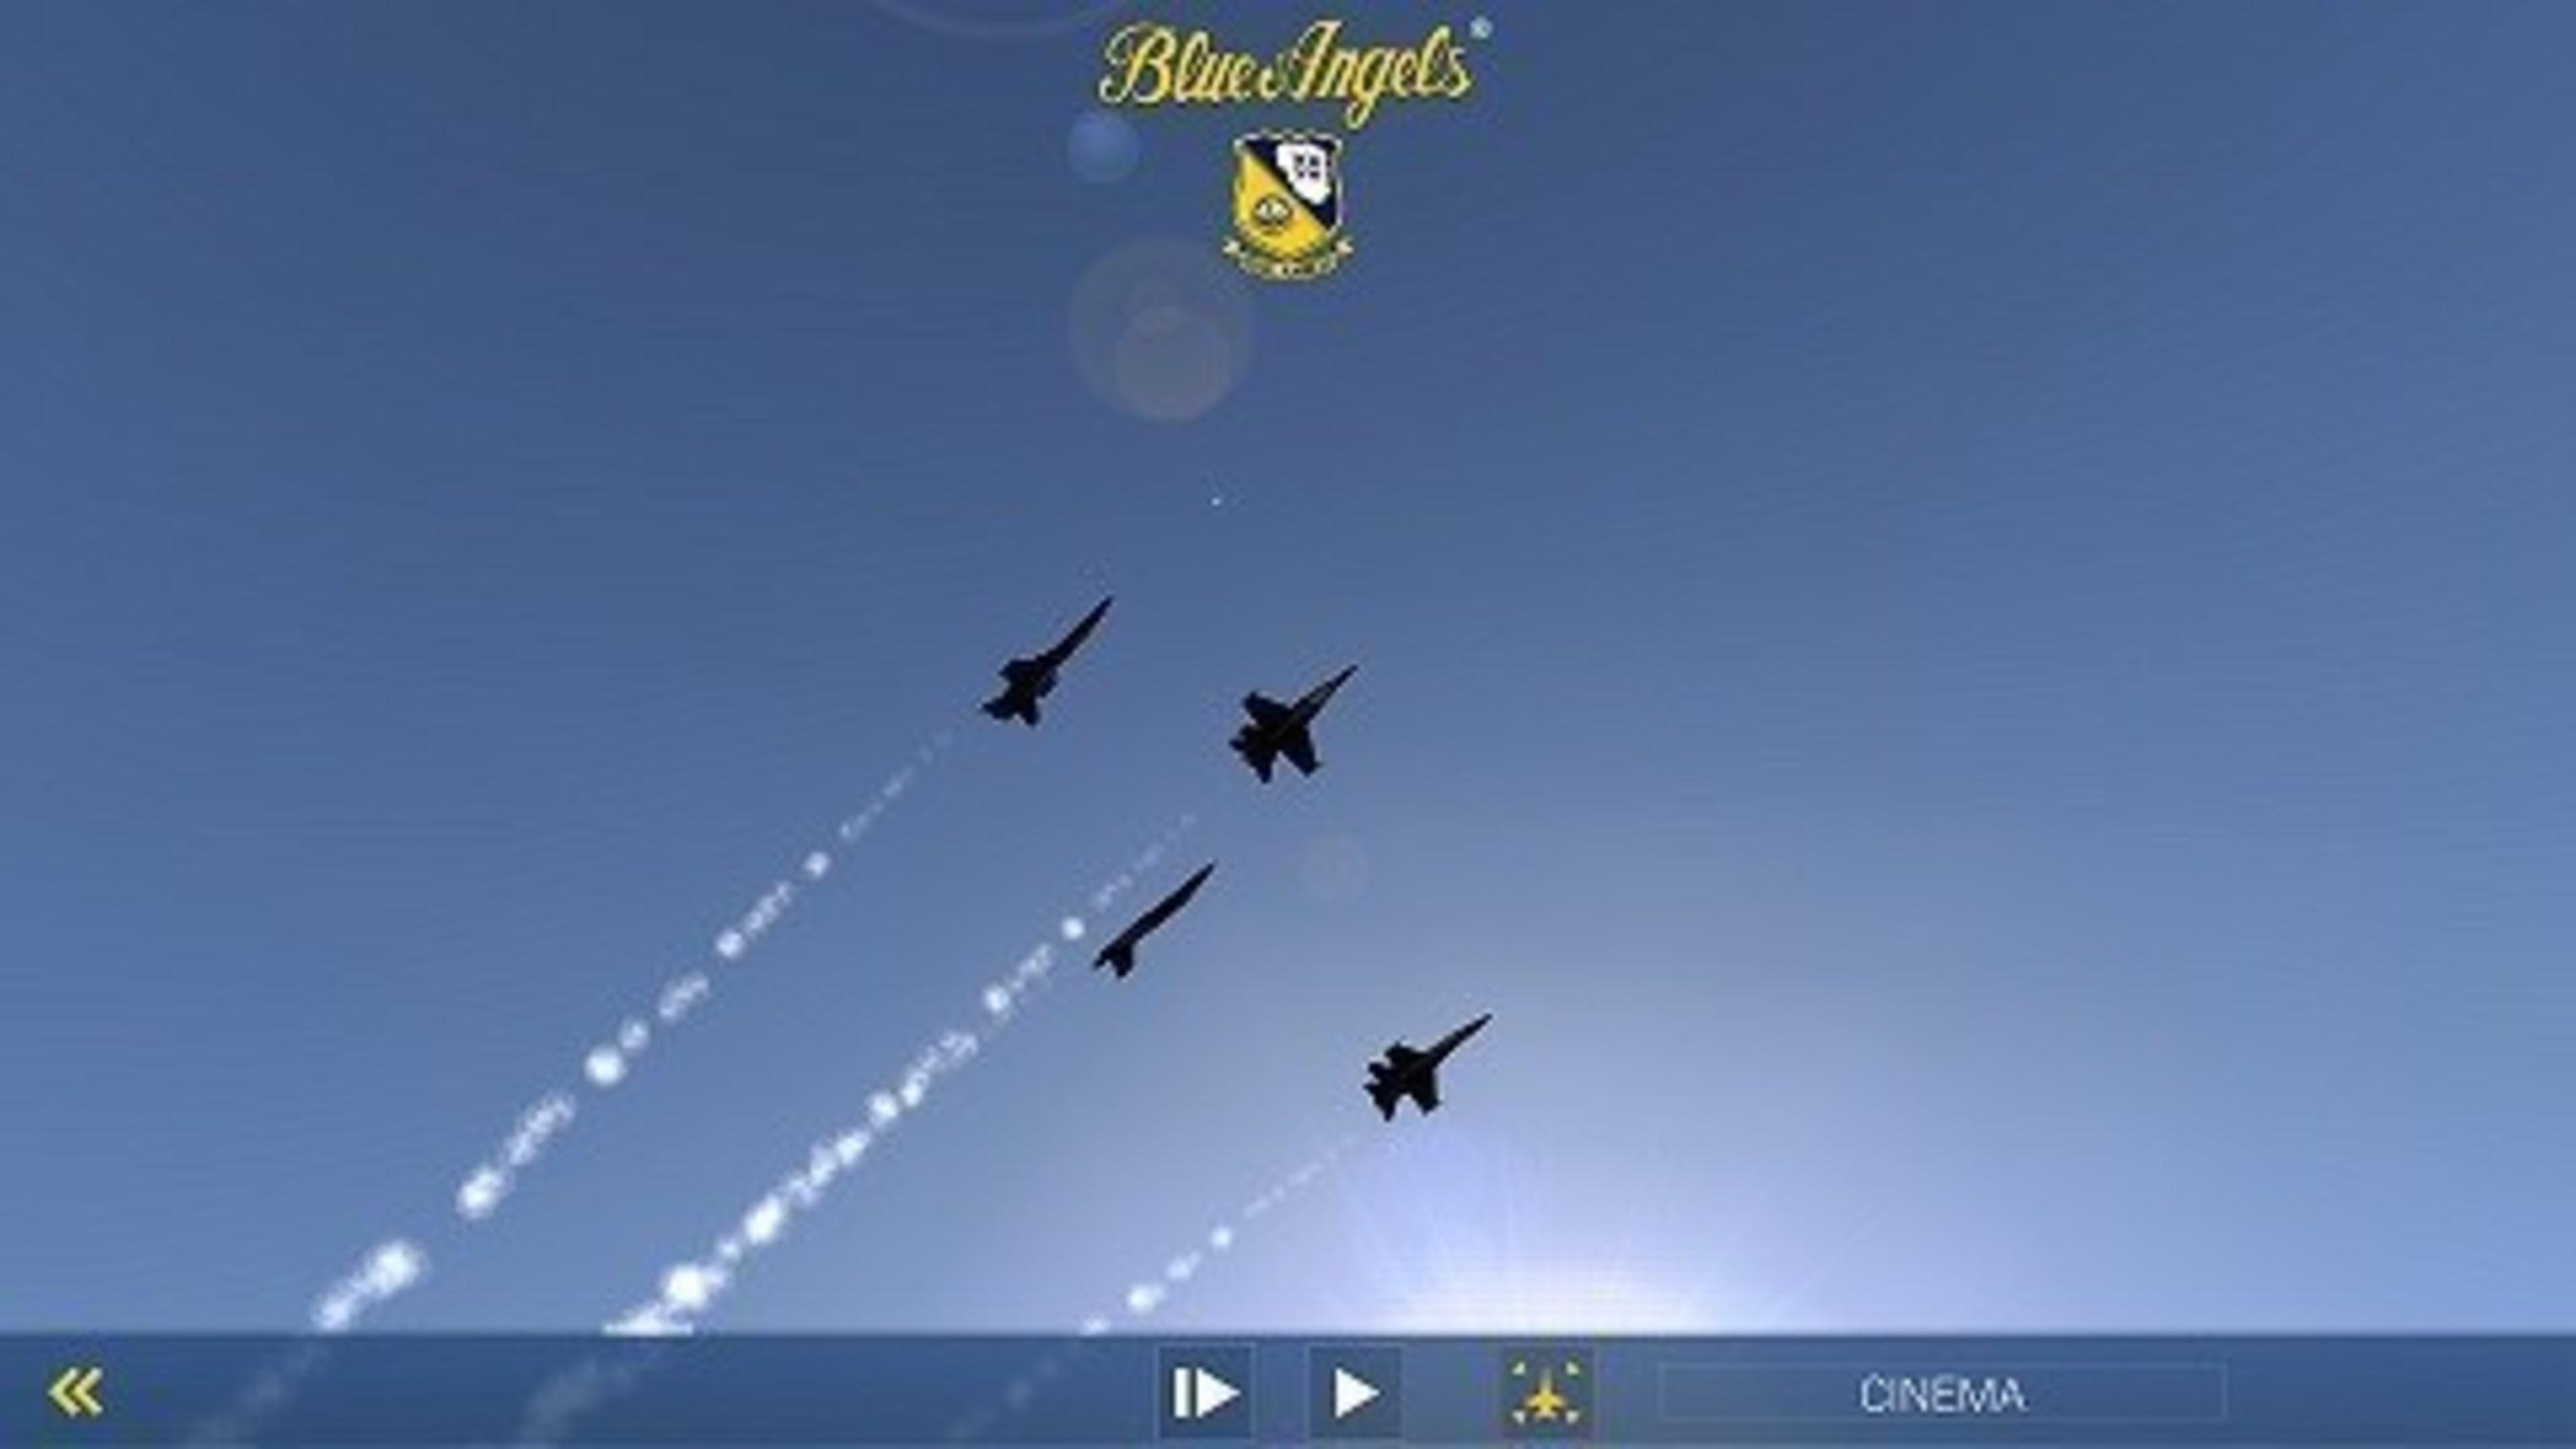 RORTOS ANNOUNCES 'BLUE ANGELS: READY, BREAK!' FOR PC WINDOWS